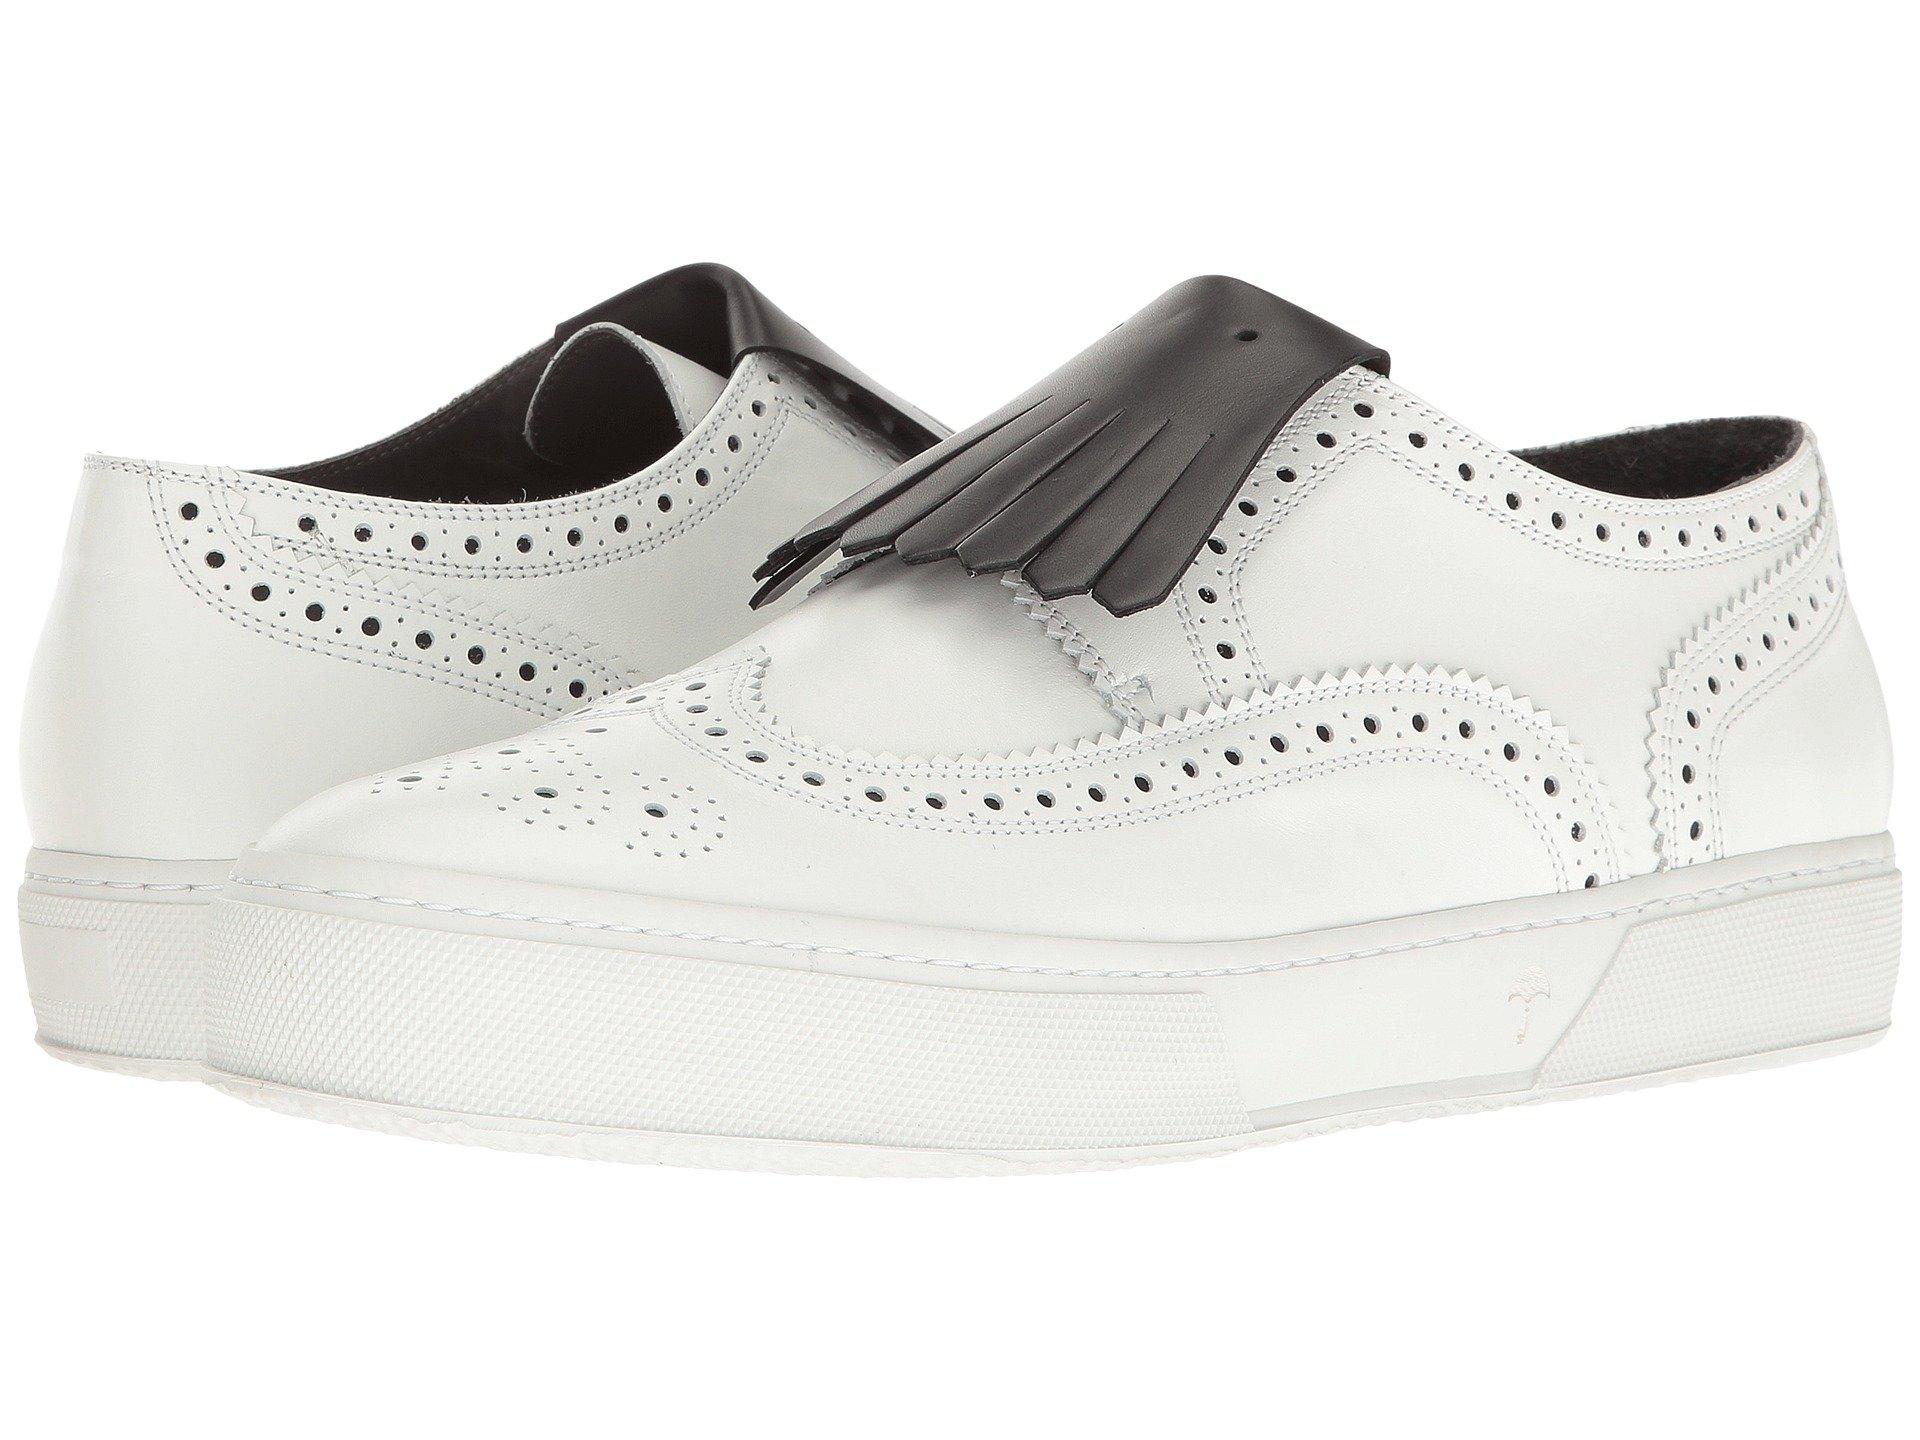 Tolka01N Kiltie Sneaker Clergerie SmIiV